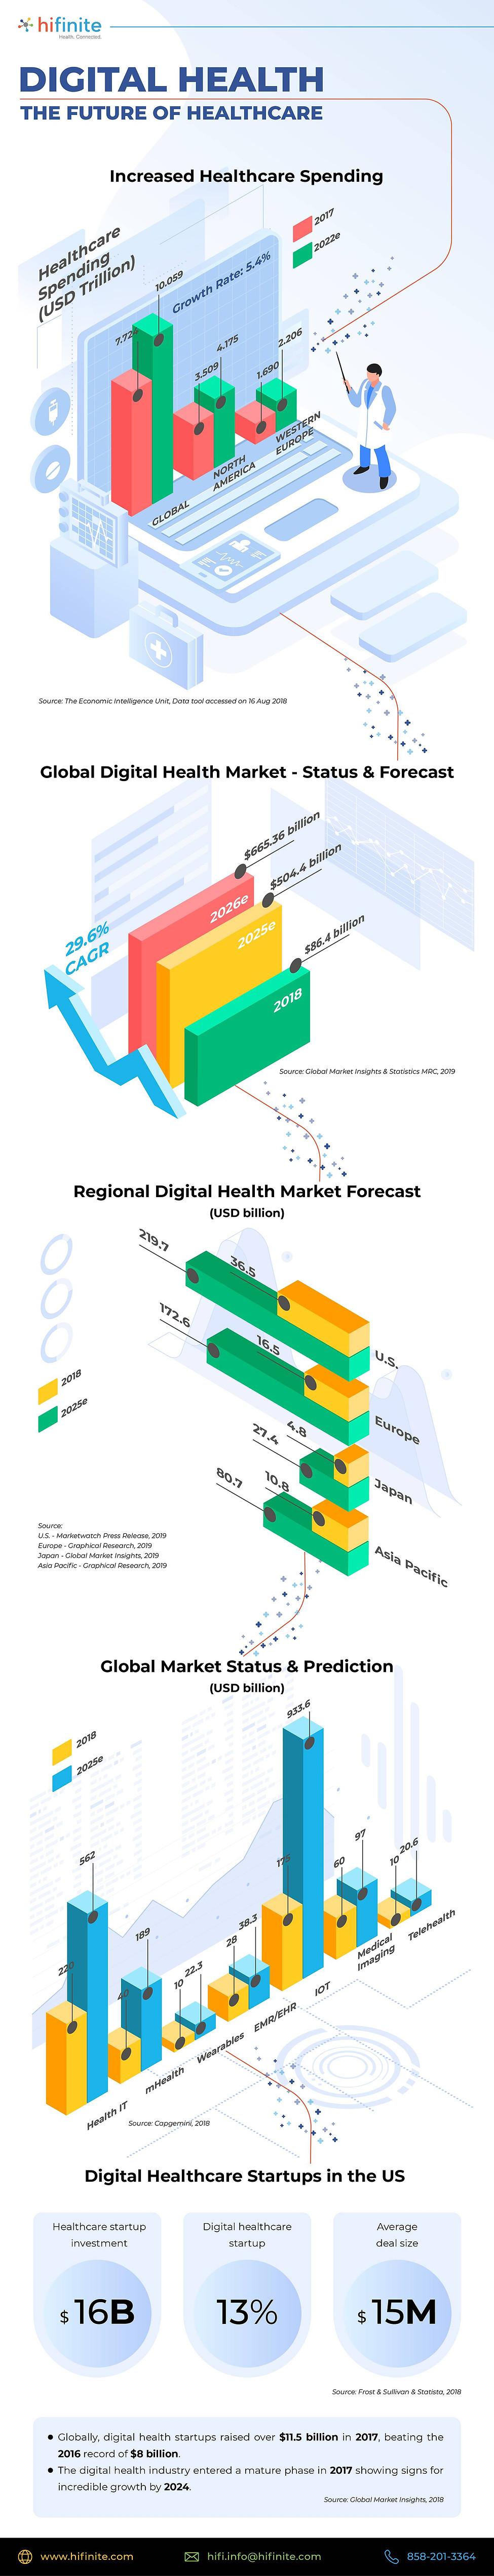 Scope - Digital Healthcare Market.jpg